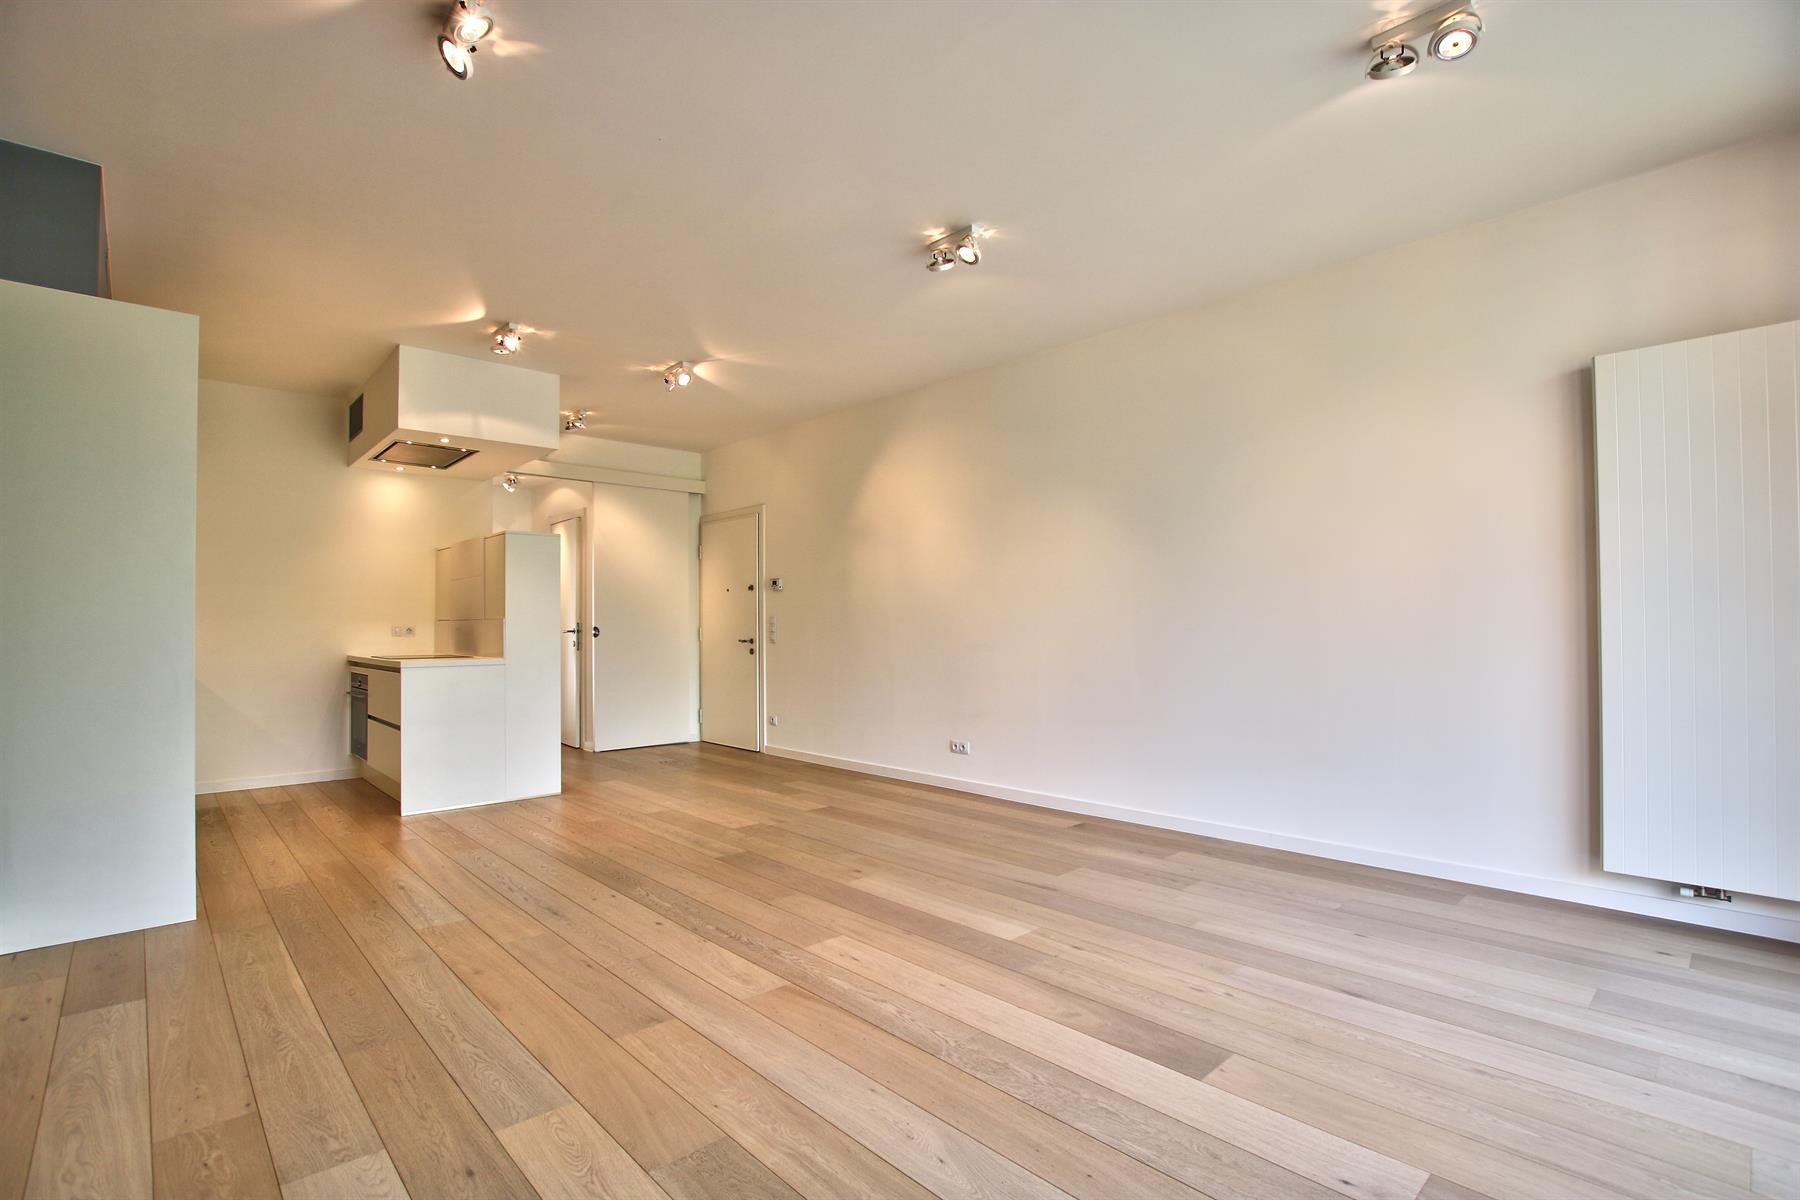 Appartement - Woluwe-Saint-Lambert - #4324368-14